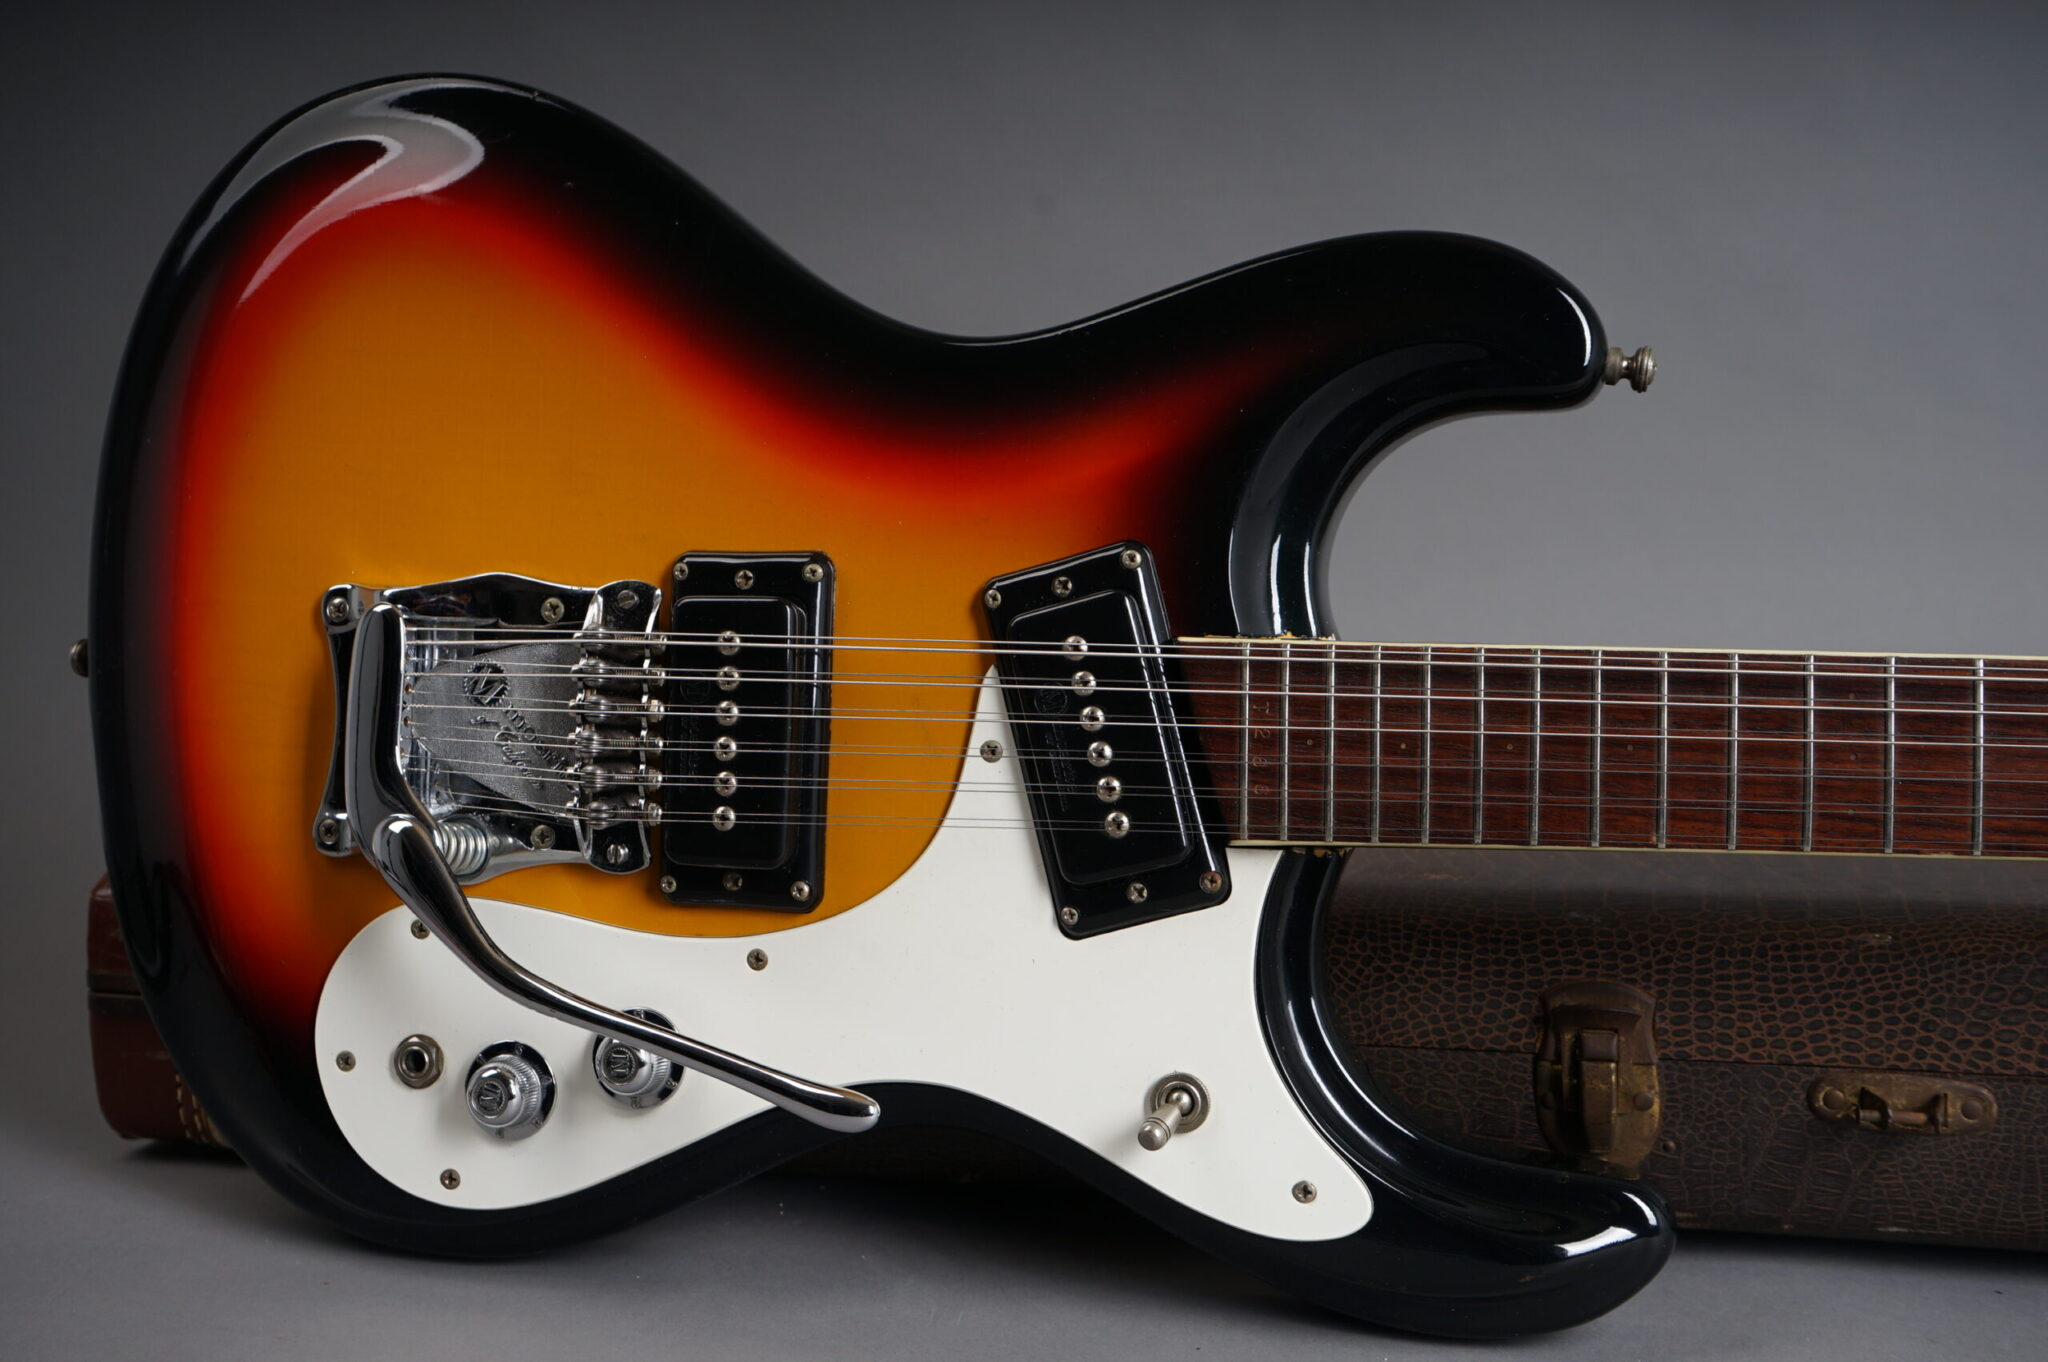 https://guitarpoint.de/app/uploads/products/1966-mosrite-ventures-mk-xii-sunburst/1966-Mosrite-Ventures-MKXII-T266-7-scaled-2048x1362.jpg